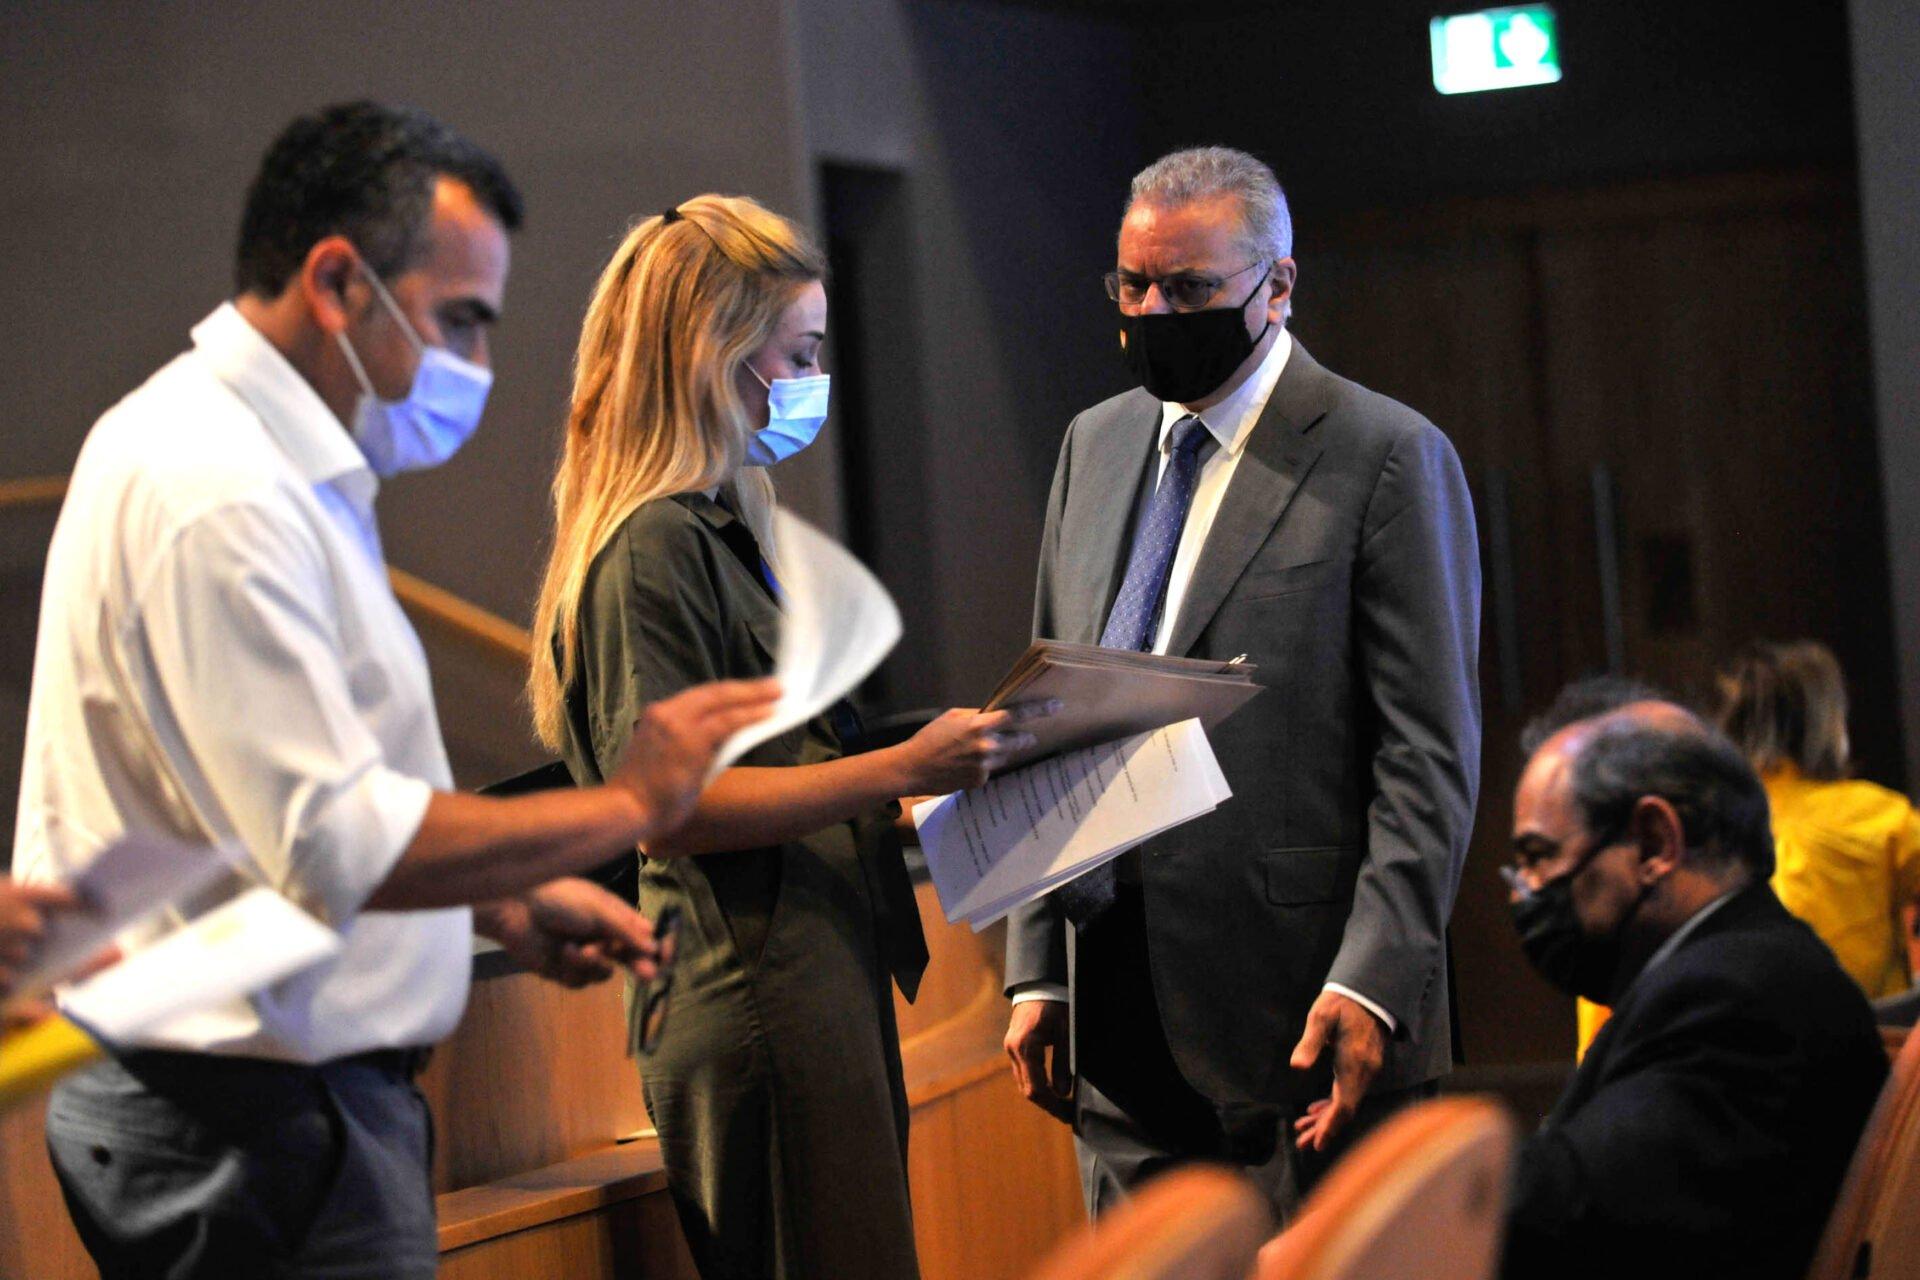 New housing support scheme will strengthen economy, Nouris says